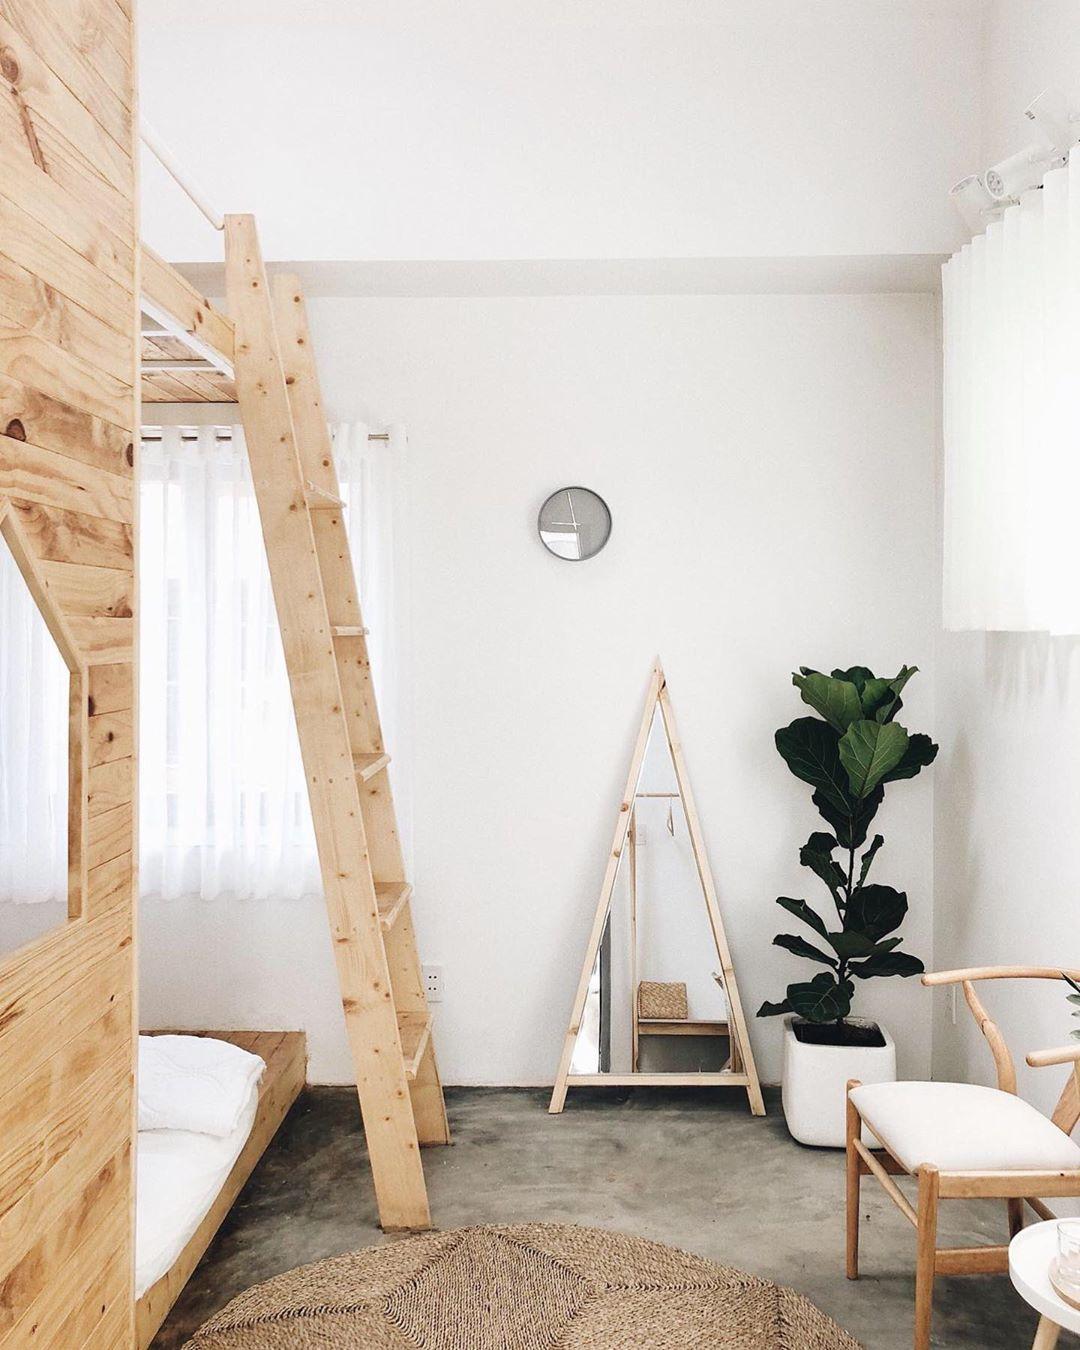 danang_ibasho-coffee-and-hostel-04